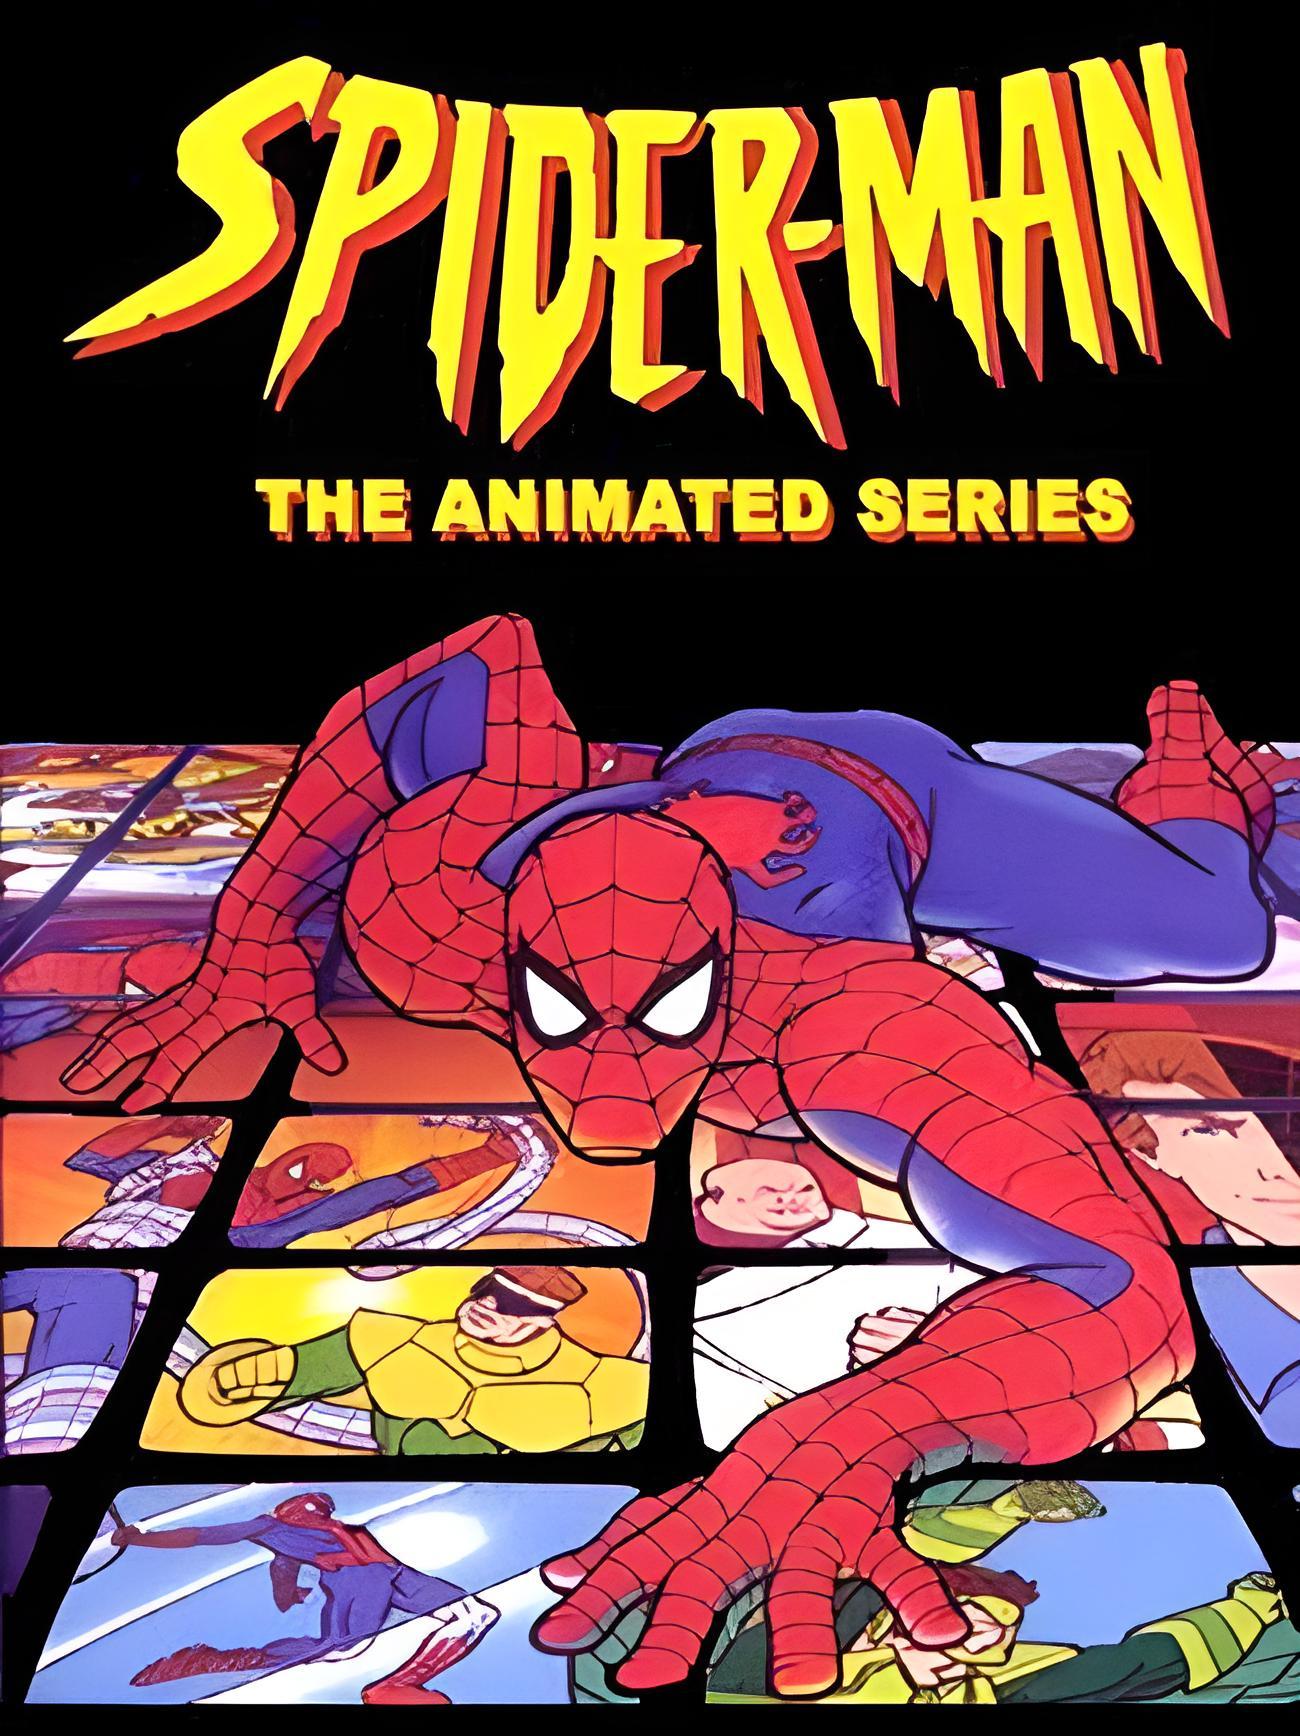 Spider-Man (serie animada)